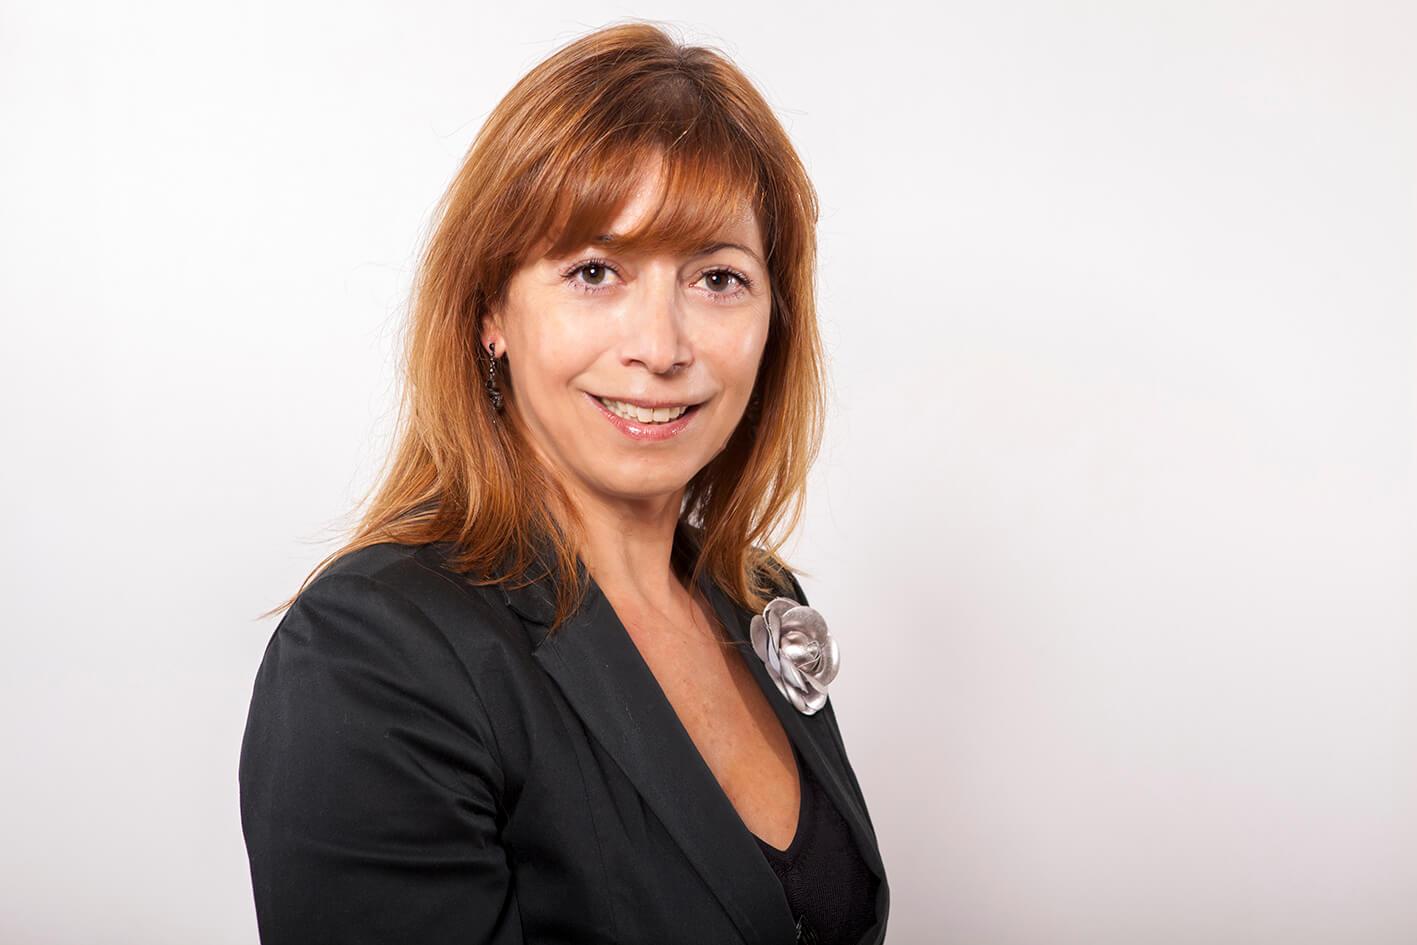 Mercedes Vidal Muiños